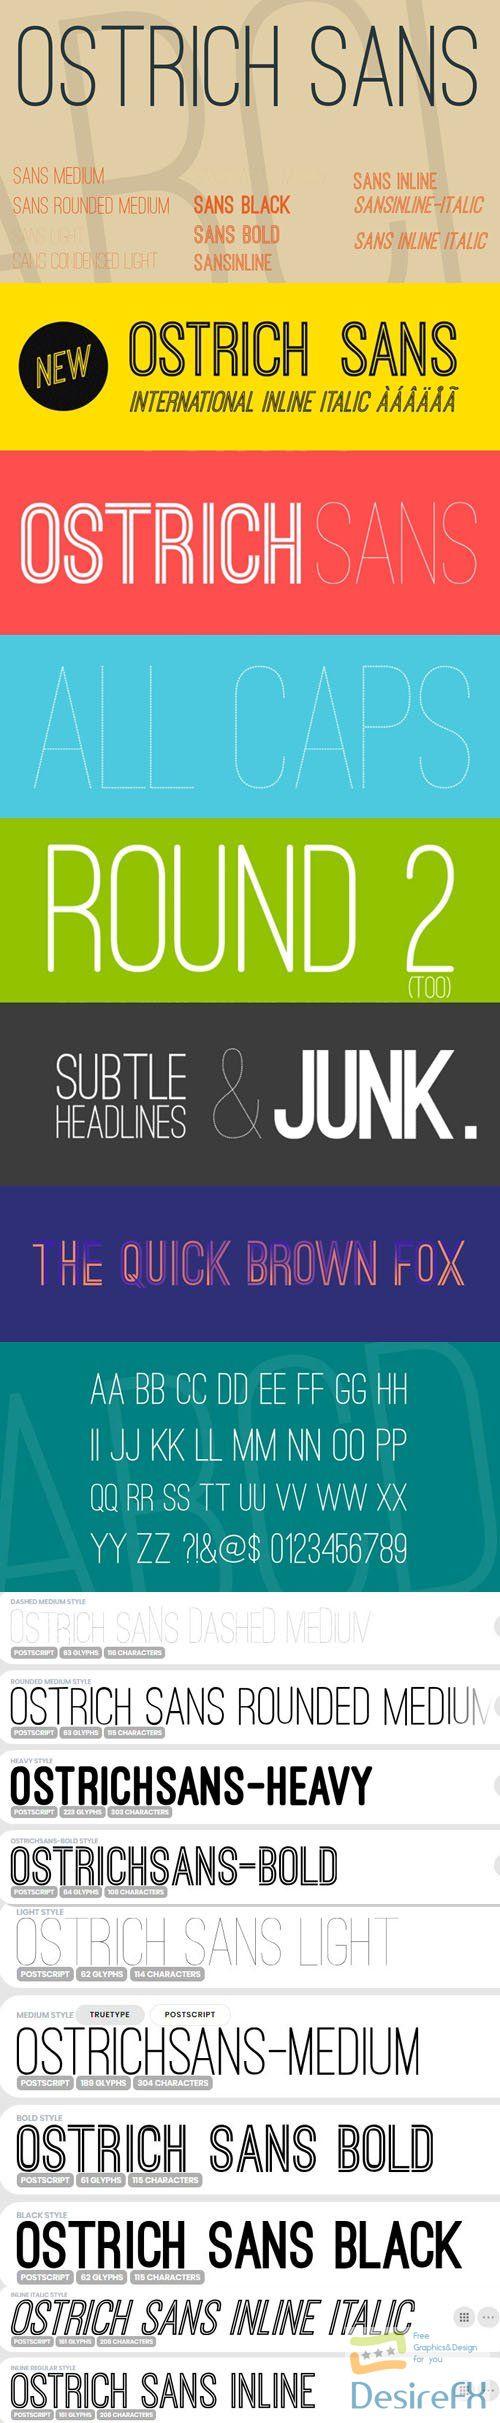 Ostrich Sans Serif Font Family 10-Weights